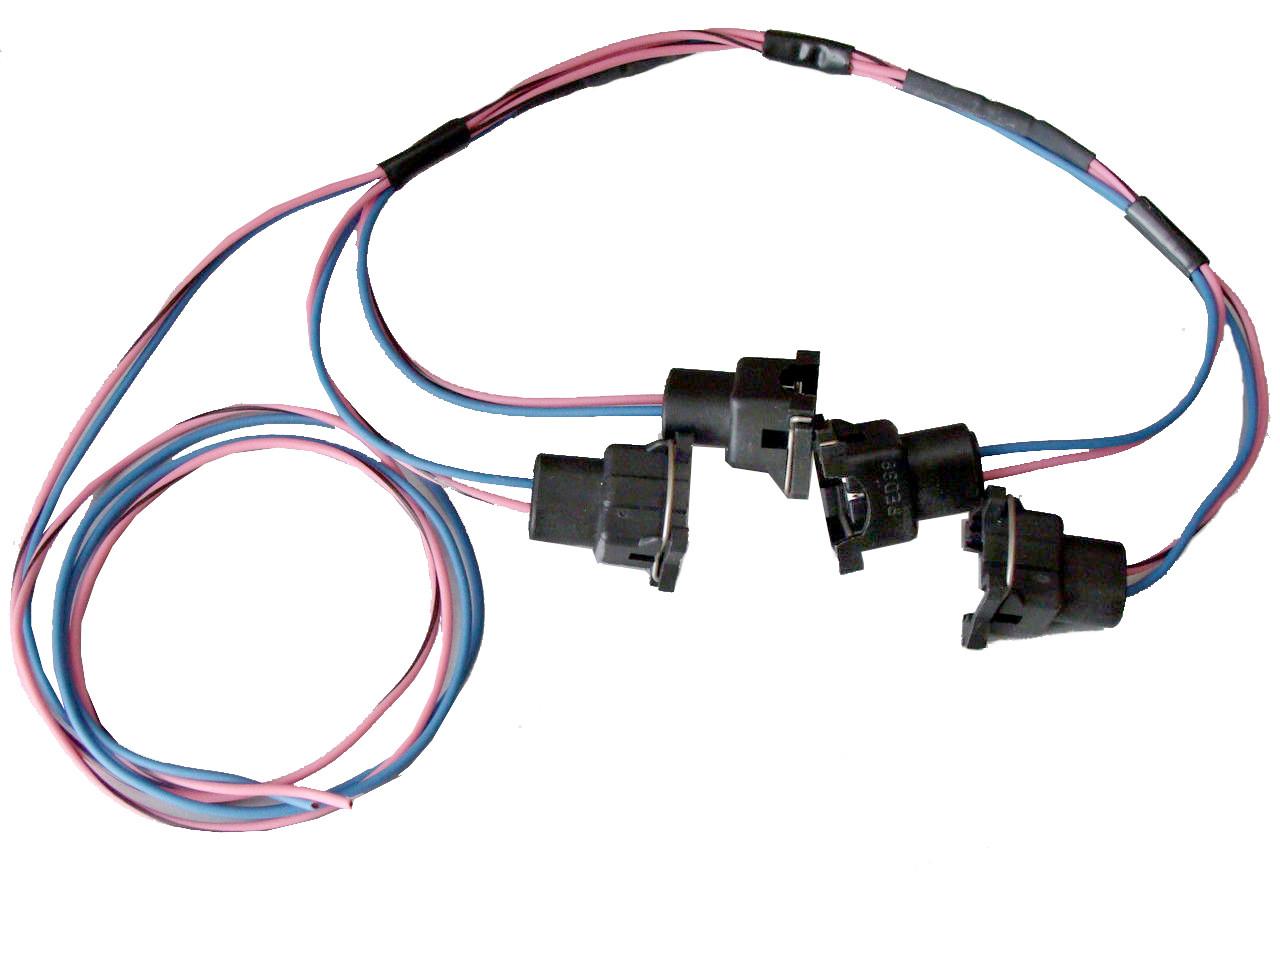 medium resolution of 85 95 tpi lt1 fuel injector connector wiring harness assembly rh rh hawksmotorsports com 95 lt1